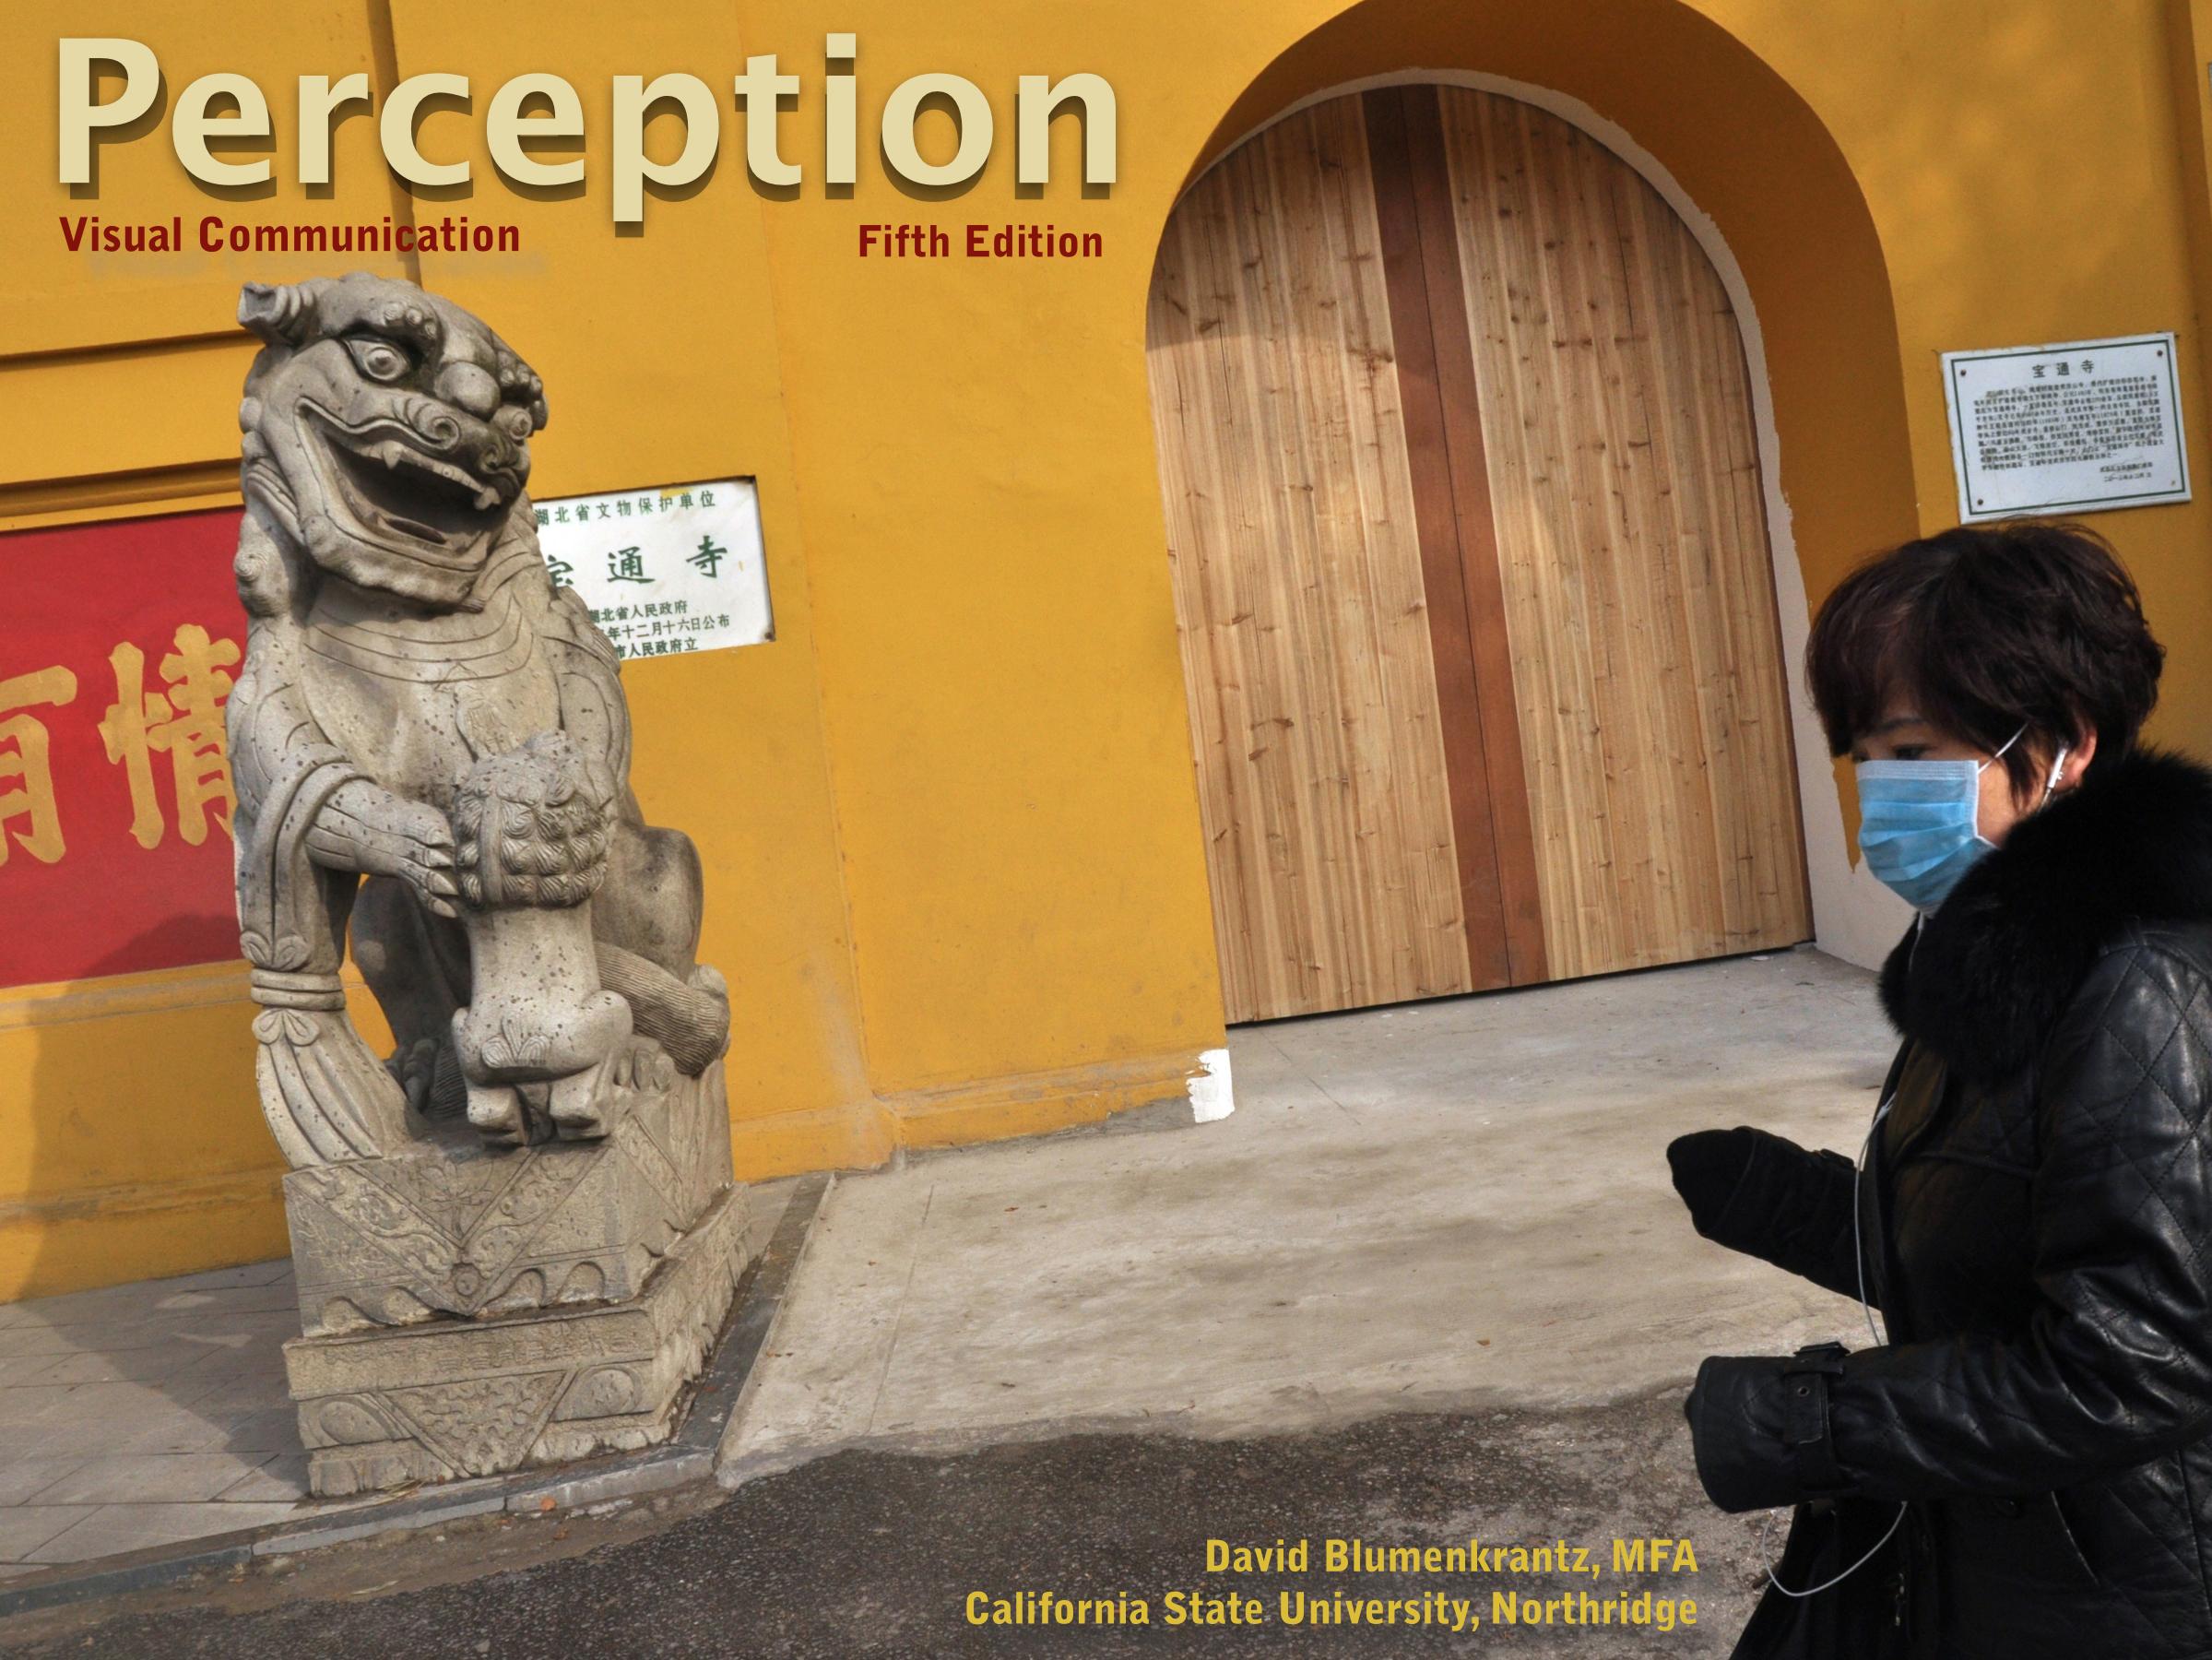 PERCEPTION COVER 5TH.jpg